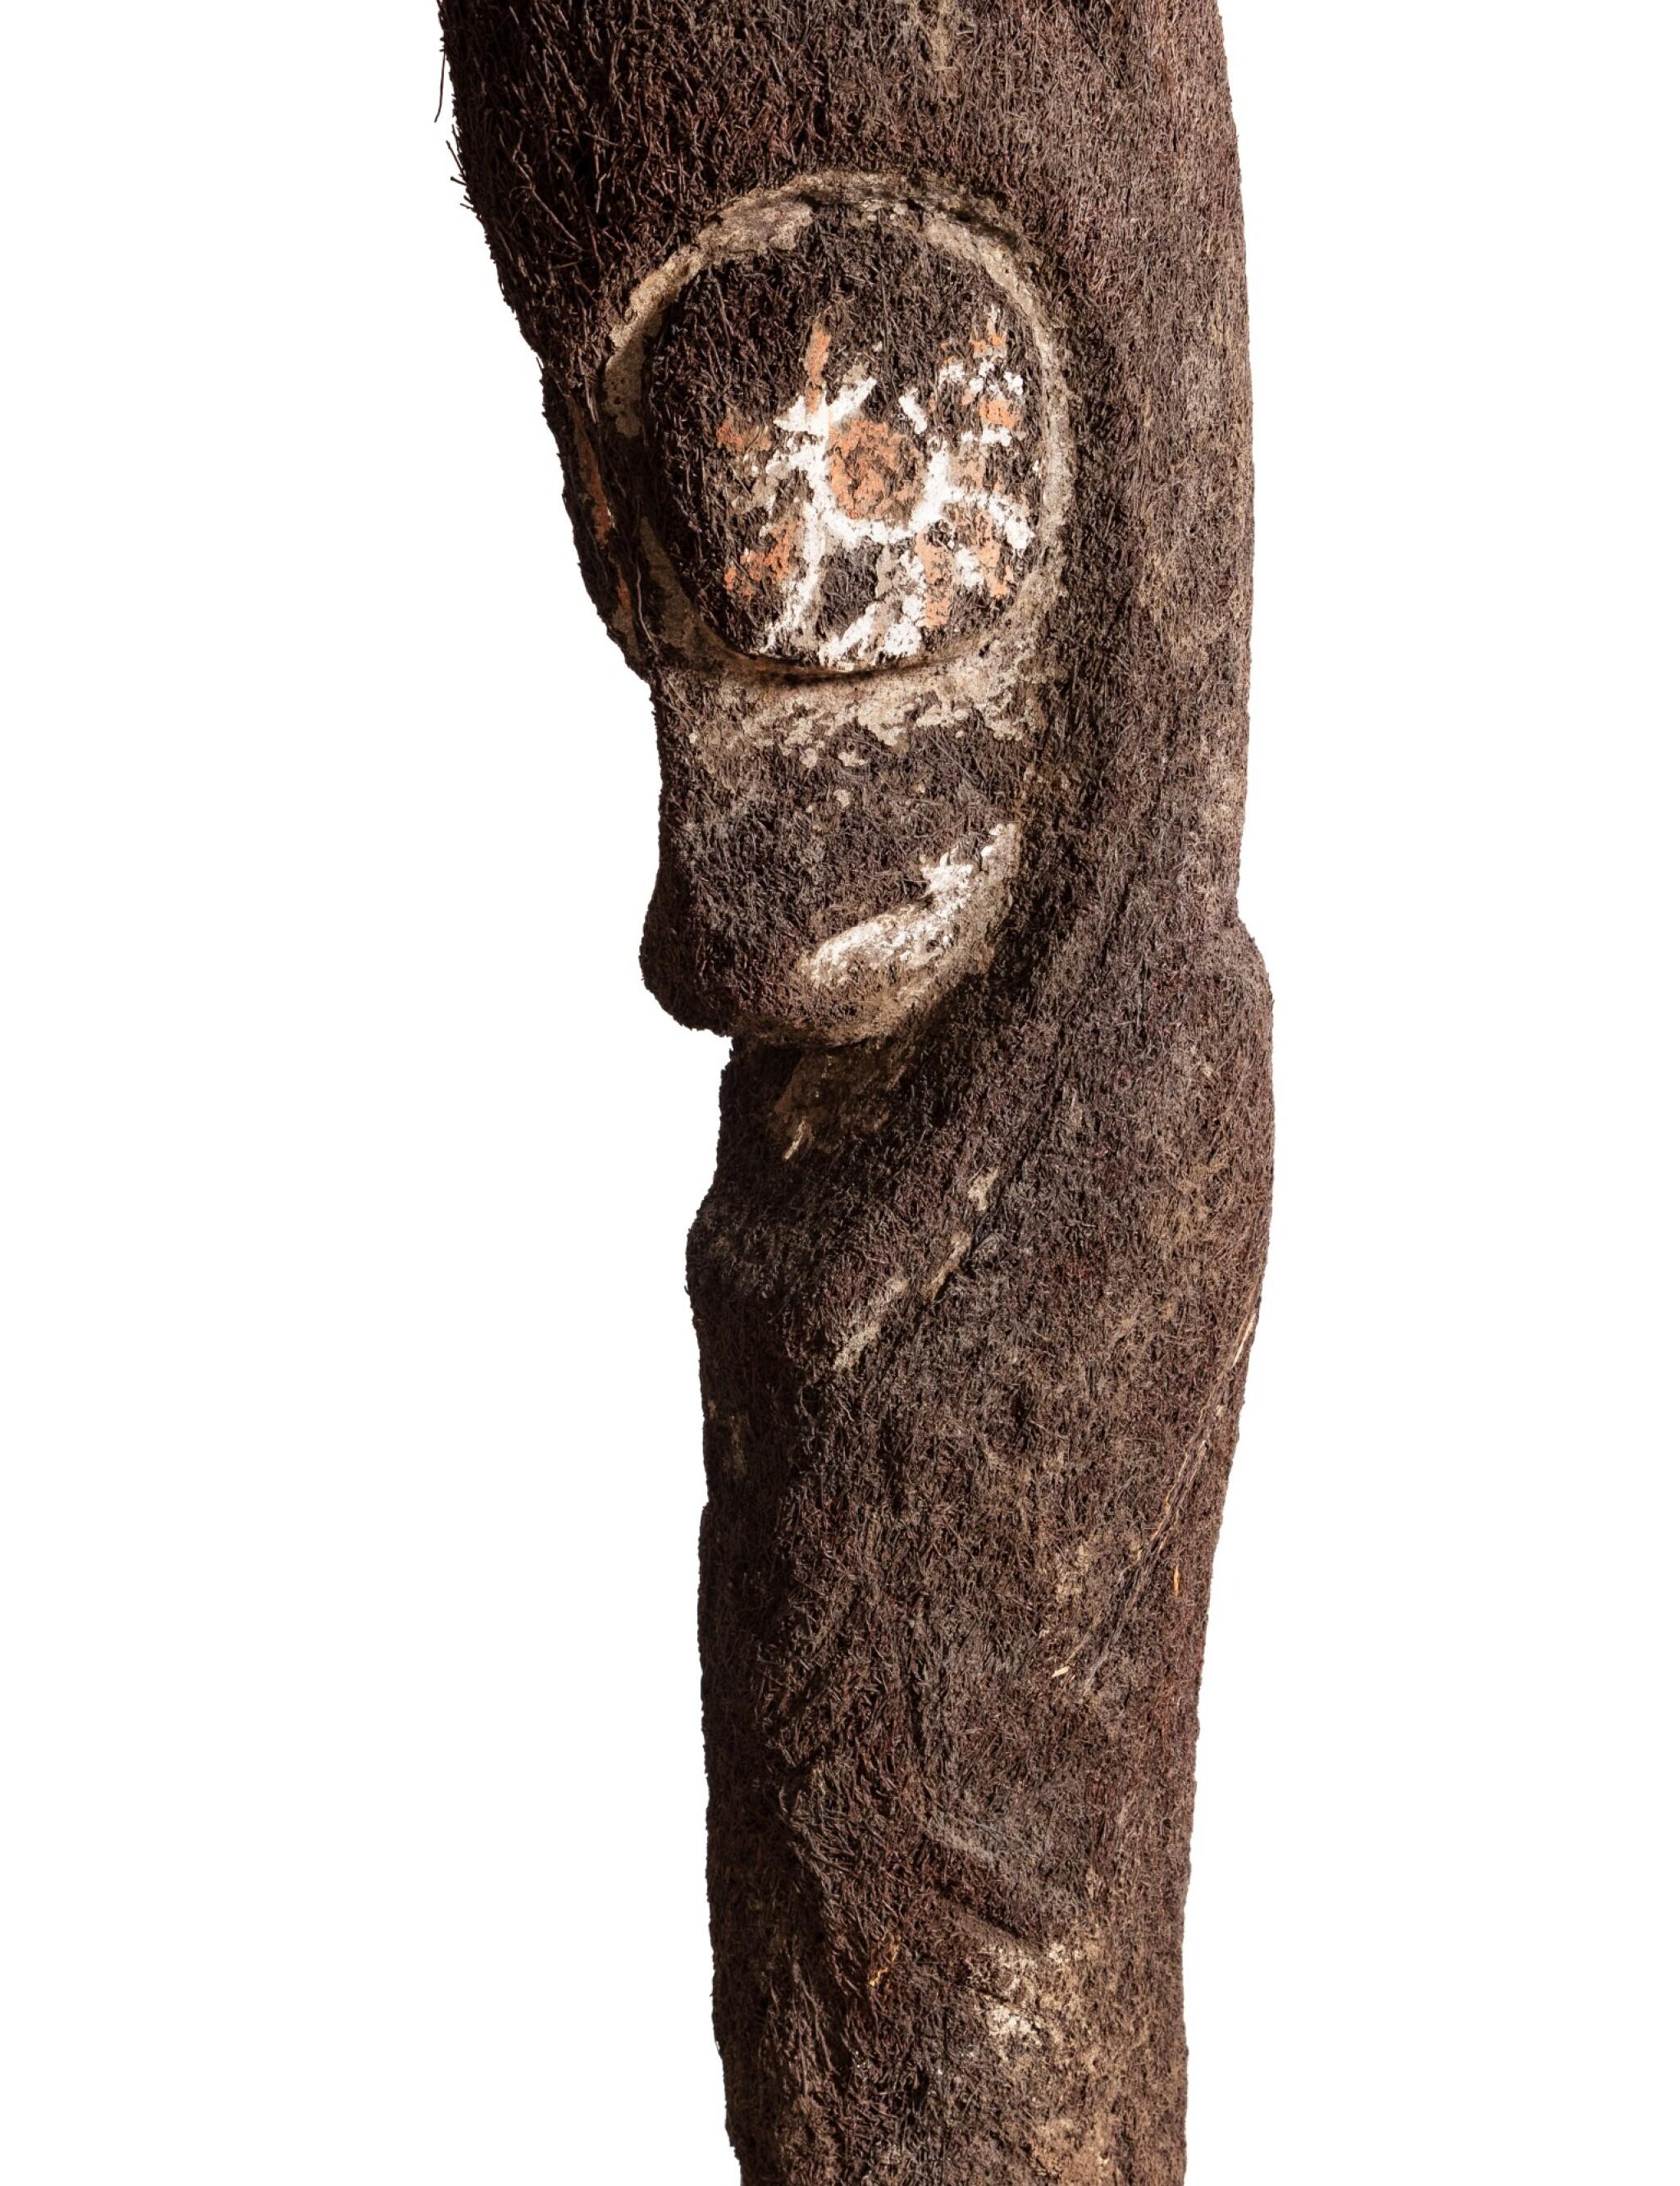 View full screen - View 1 of Lot 67. Statue de grade en fougère arborescente, Archipel du Vanuatu | Tree-Fern grade-figure, Vanuatu Archipelago.